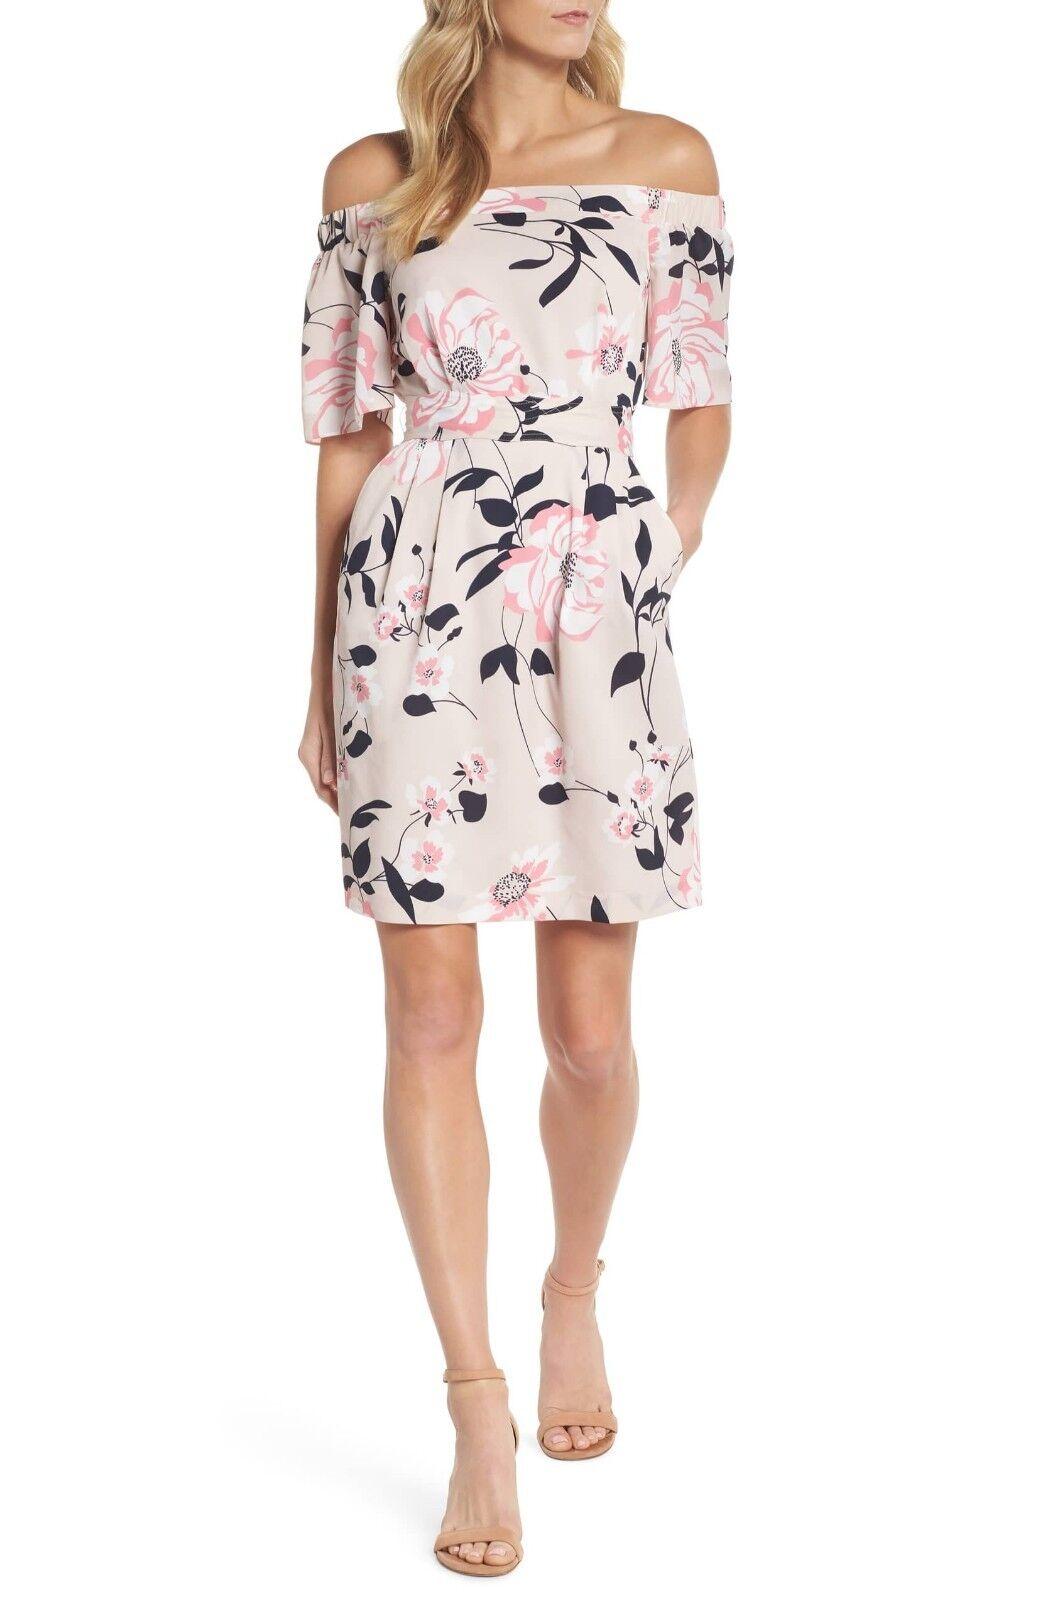 08d776f2d64a83 Eliza JOff the Shoulder Obi Dress (size 12) nrdzmh1078-Dresses - www ...